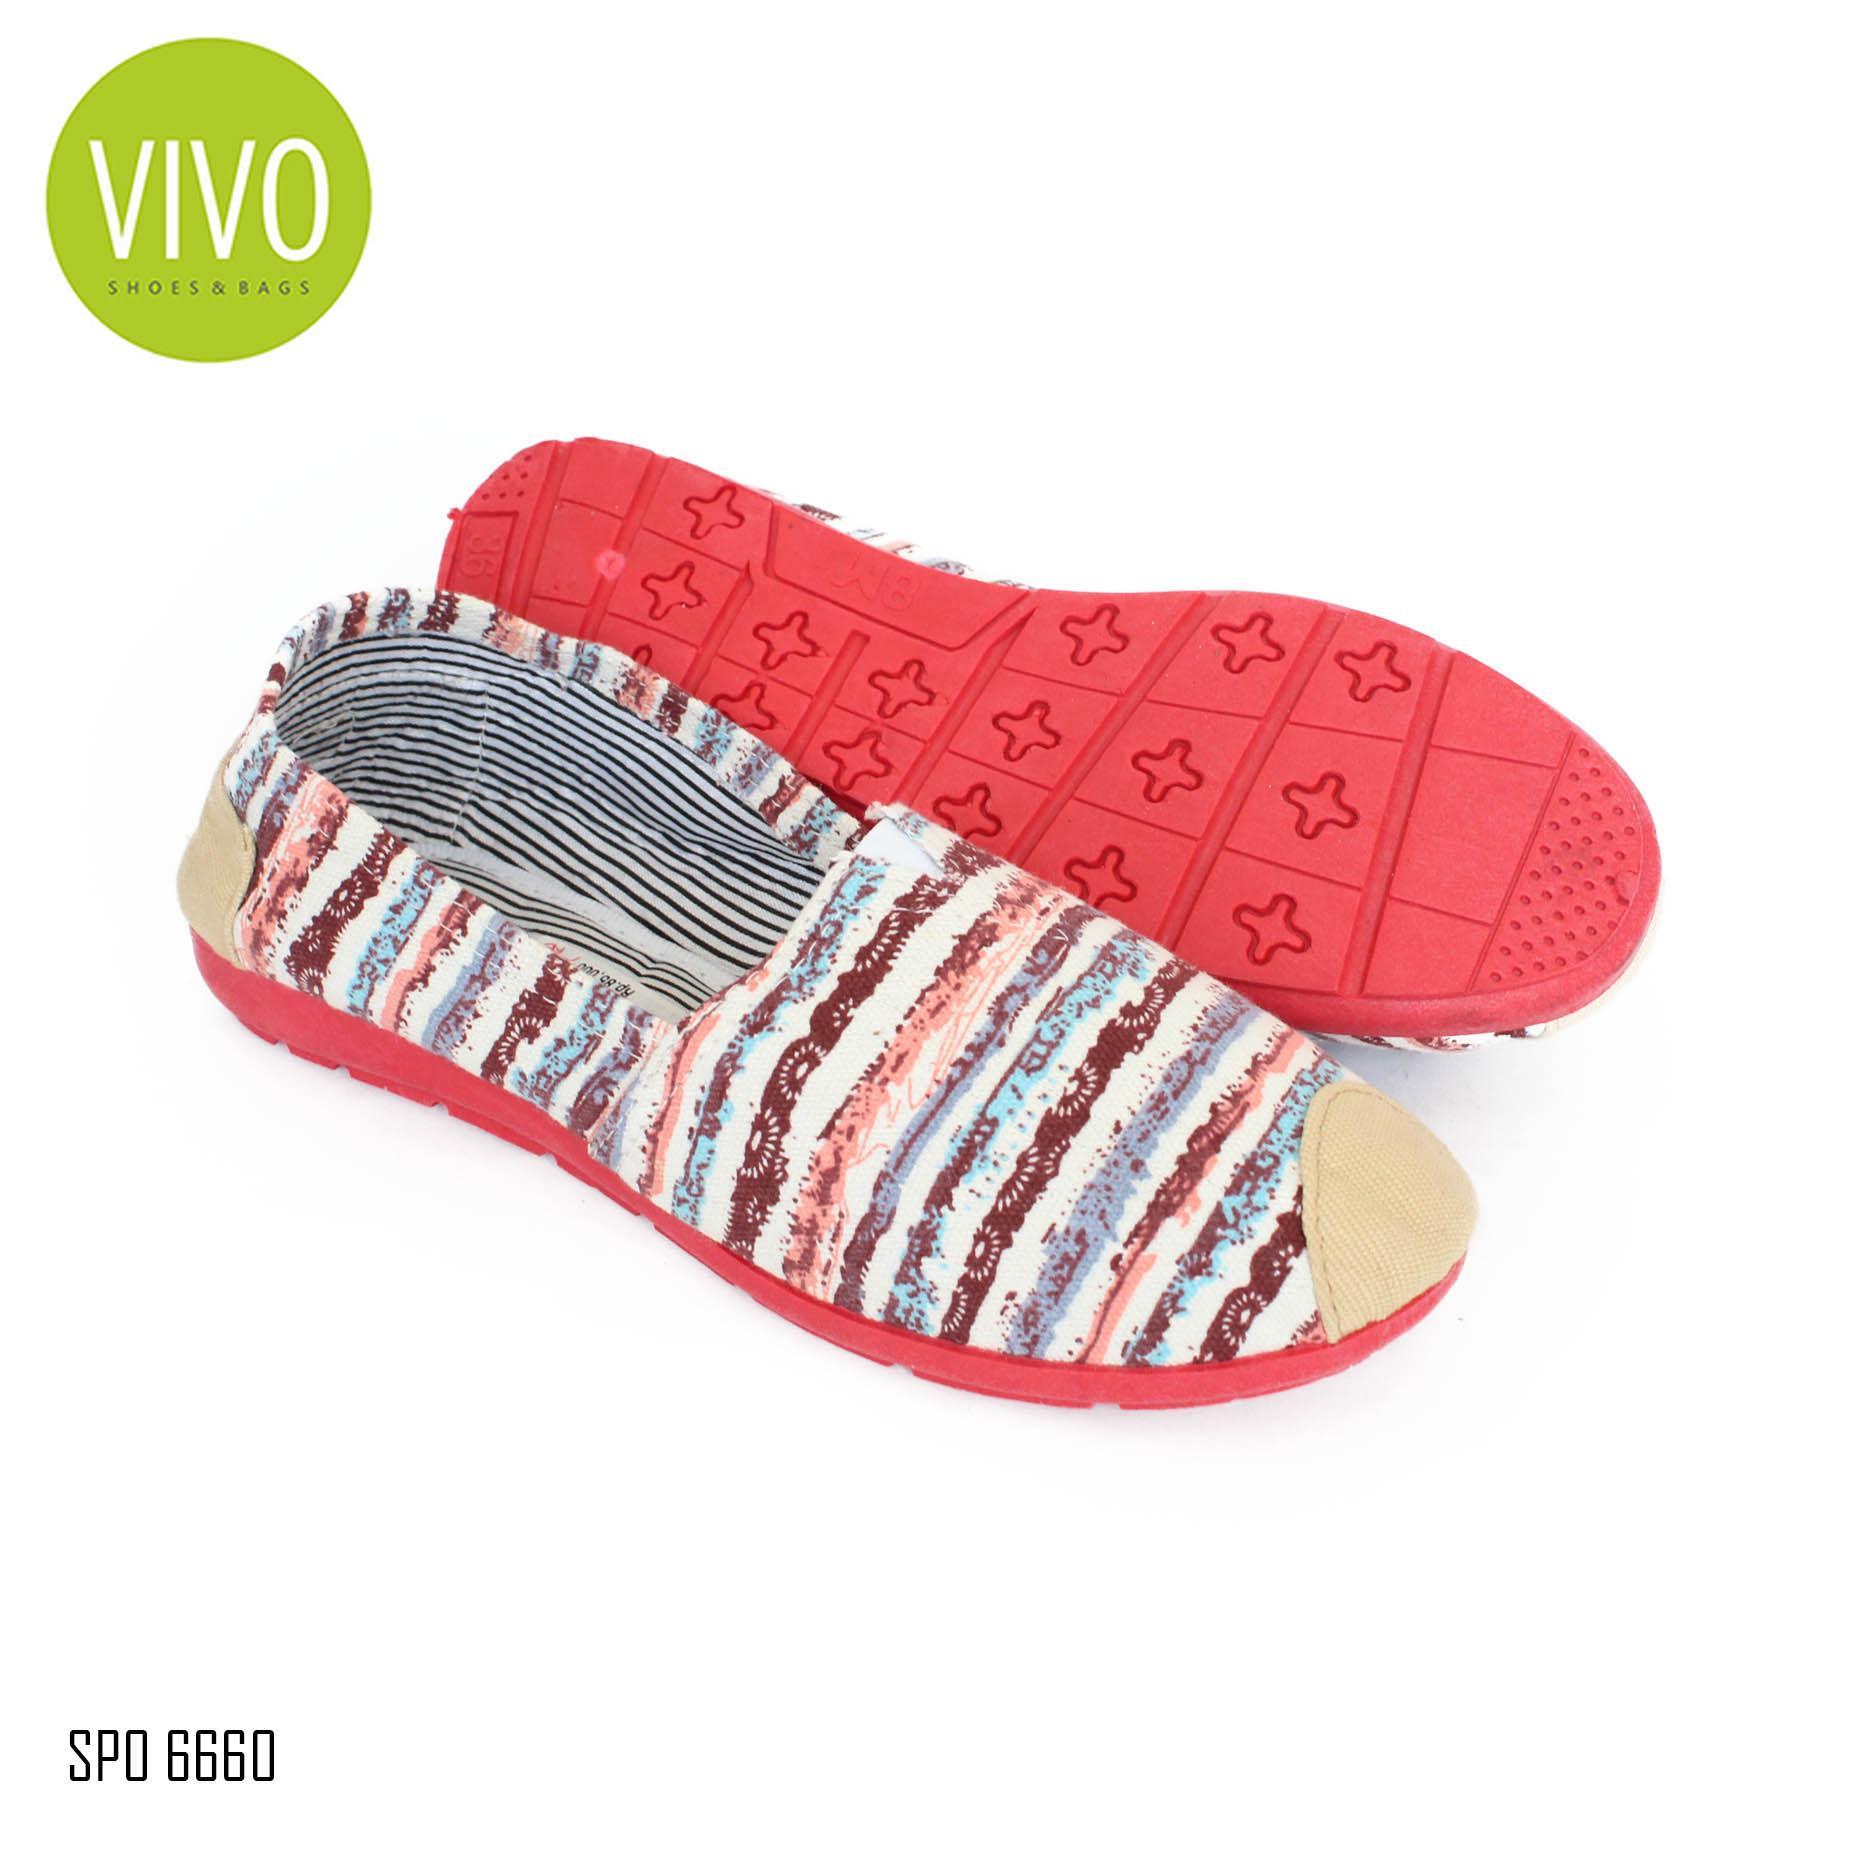 Vivo Shoes & Bags Sepatu Wanita Flat Shoes Wanita Sepatu Casual  Wanita Sepatu Slip On Wanita SP06660 - Maroon Size 35/40